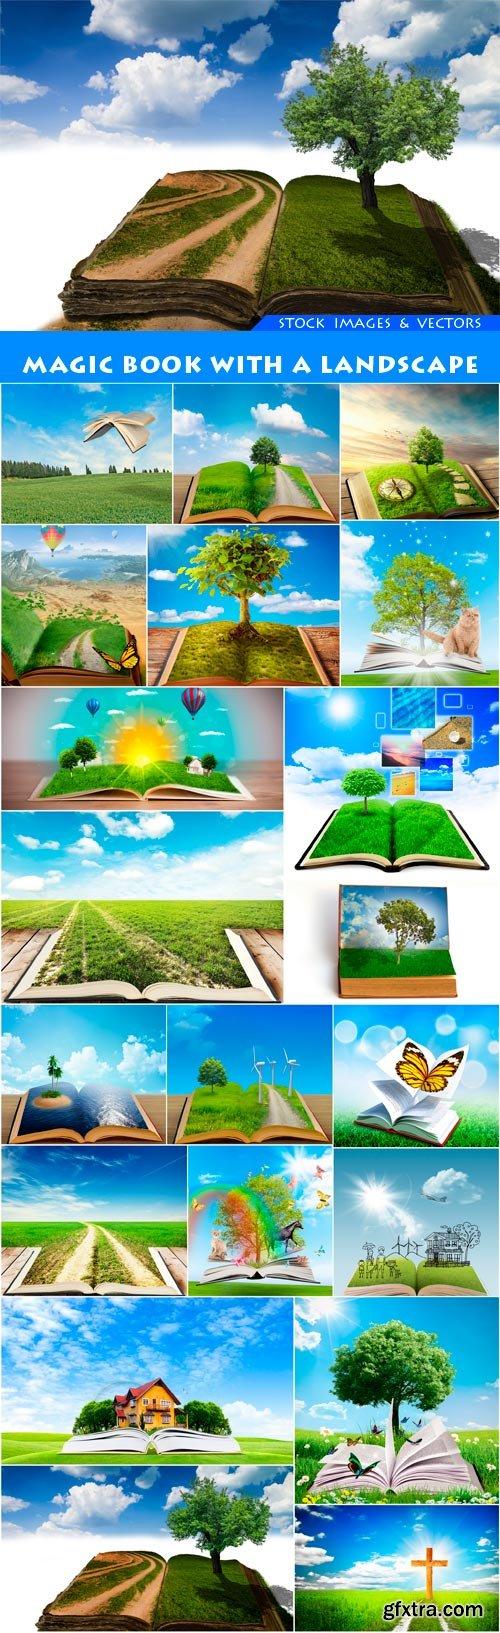 magic book with a landscape 20X JPEG